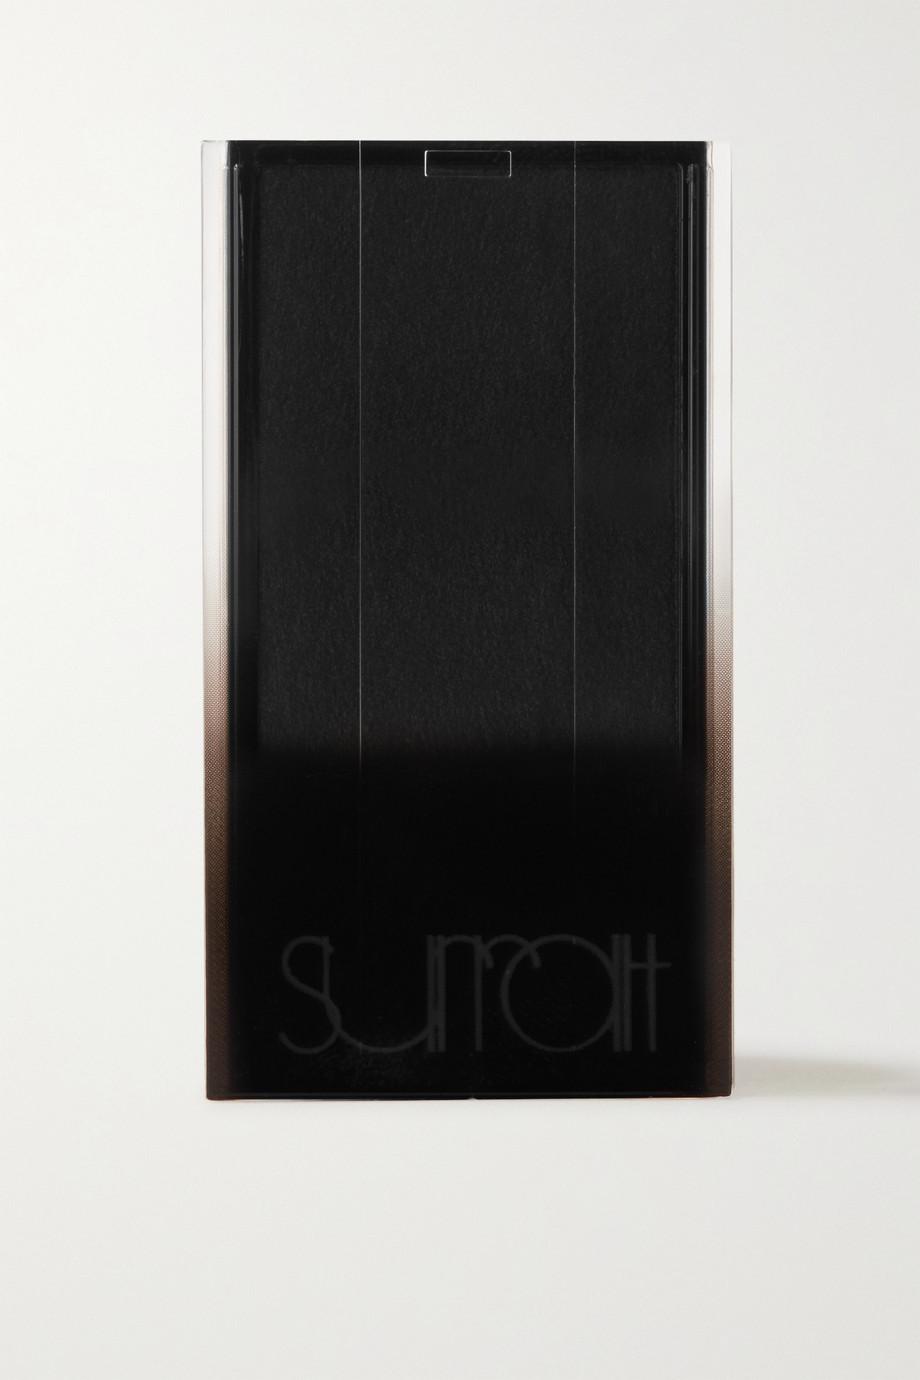 Surratt Beauty Halogram Cream Eyeshadow - Dark Matter